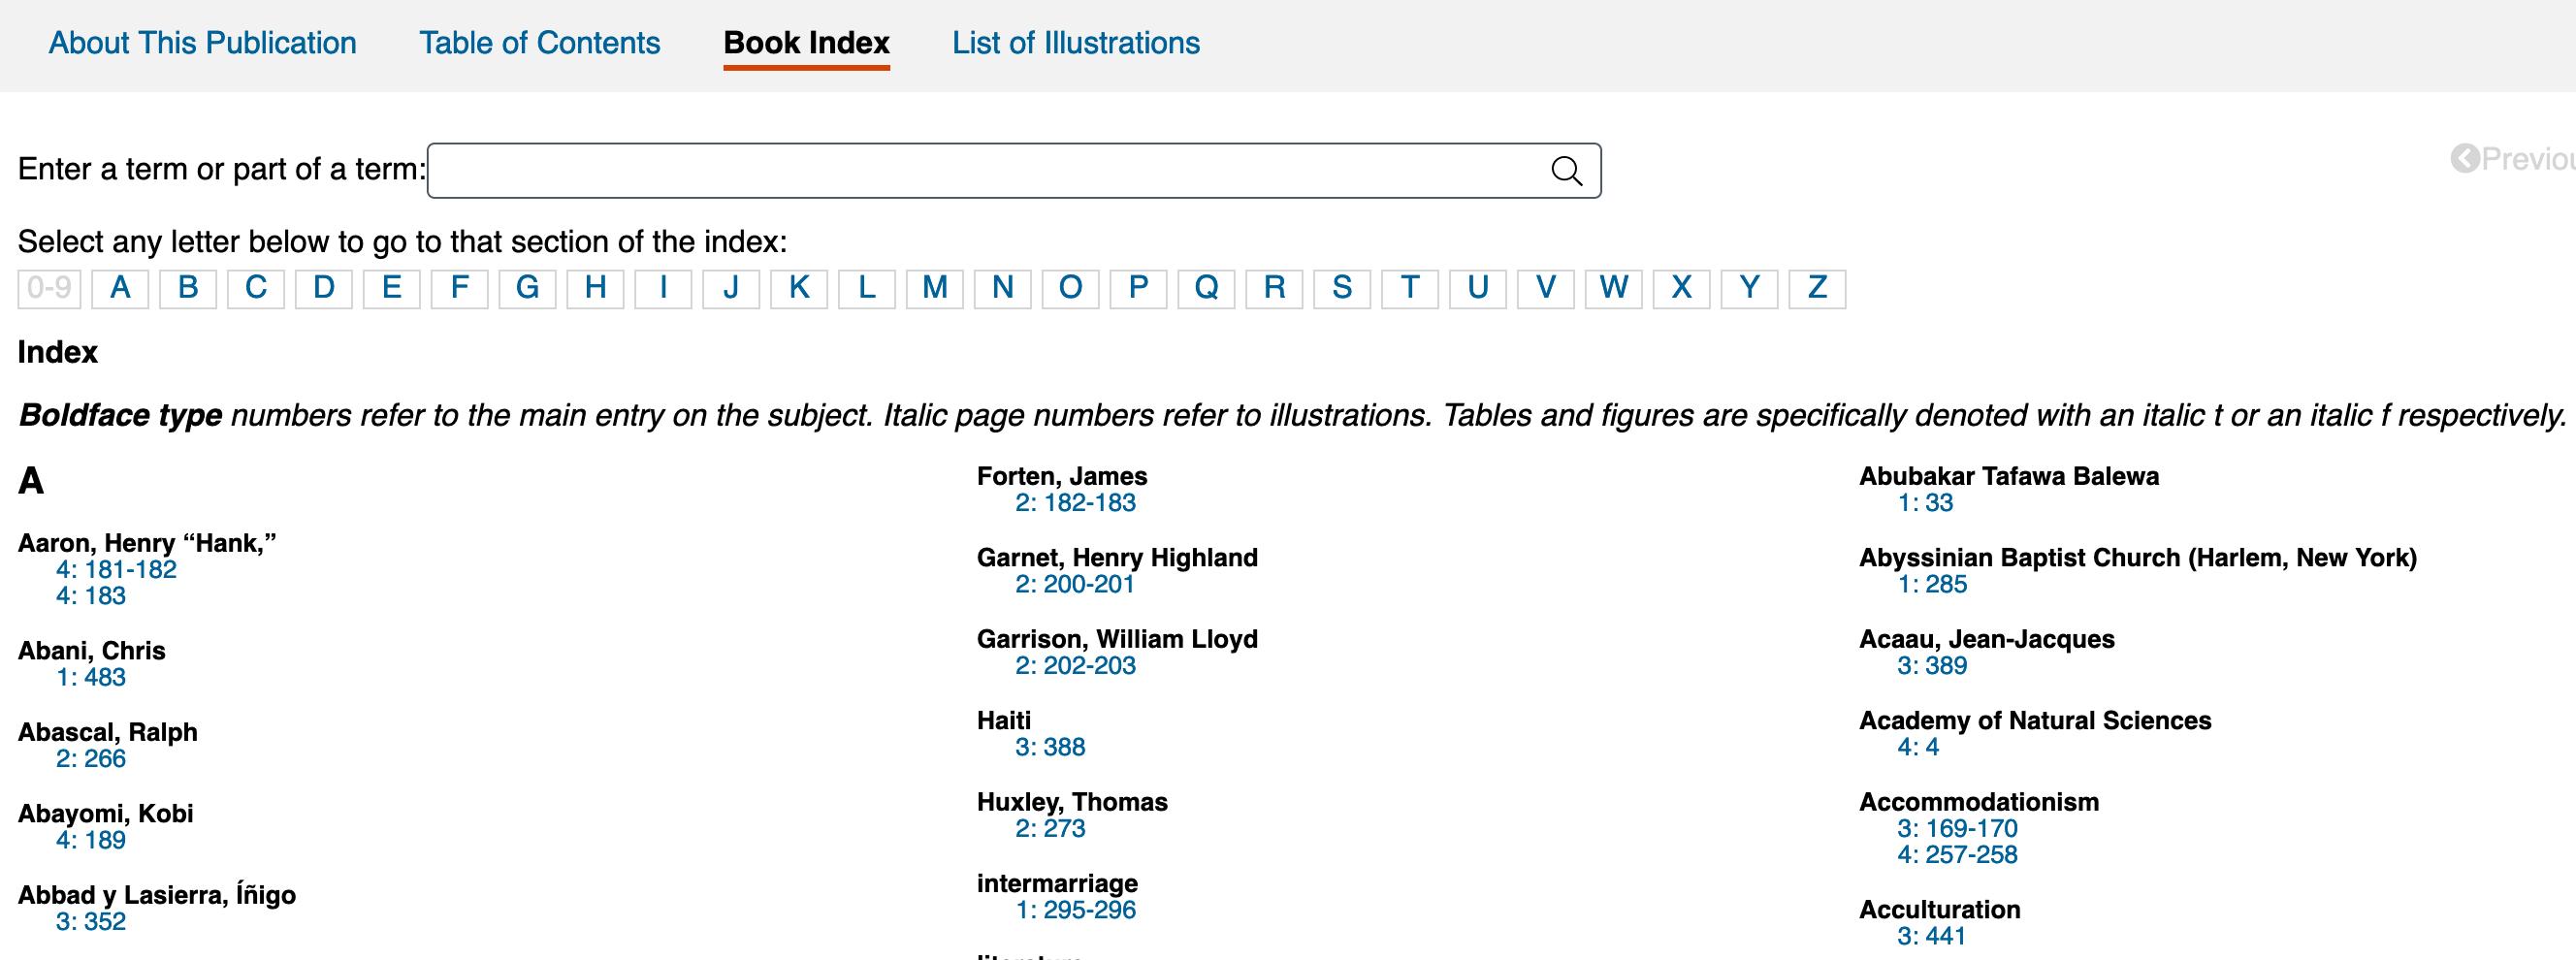 Screenshot of a book index